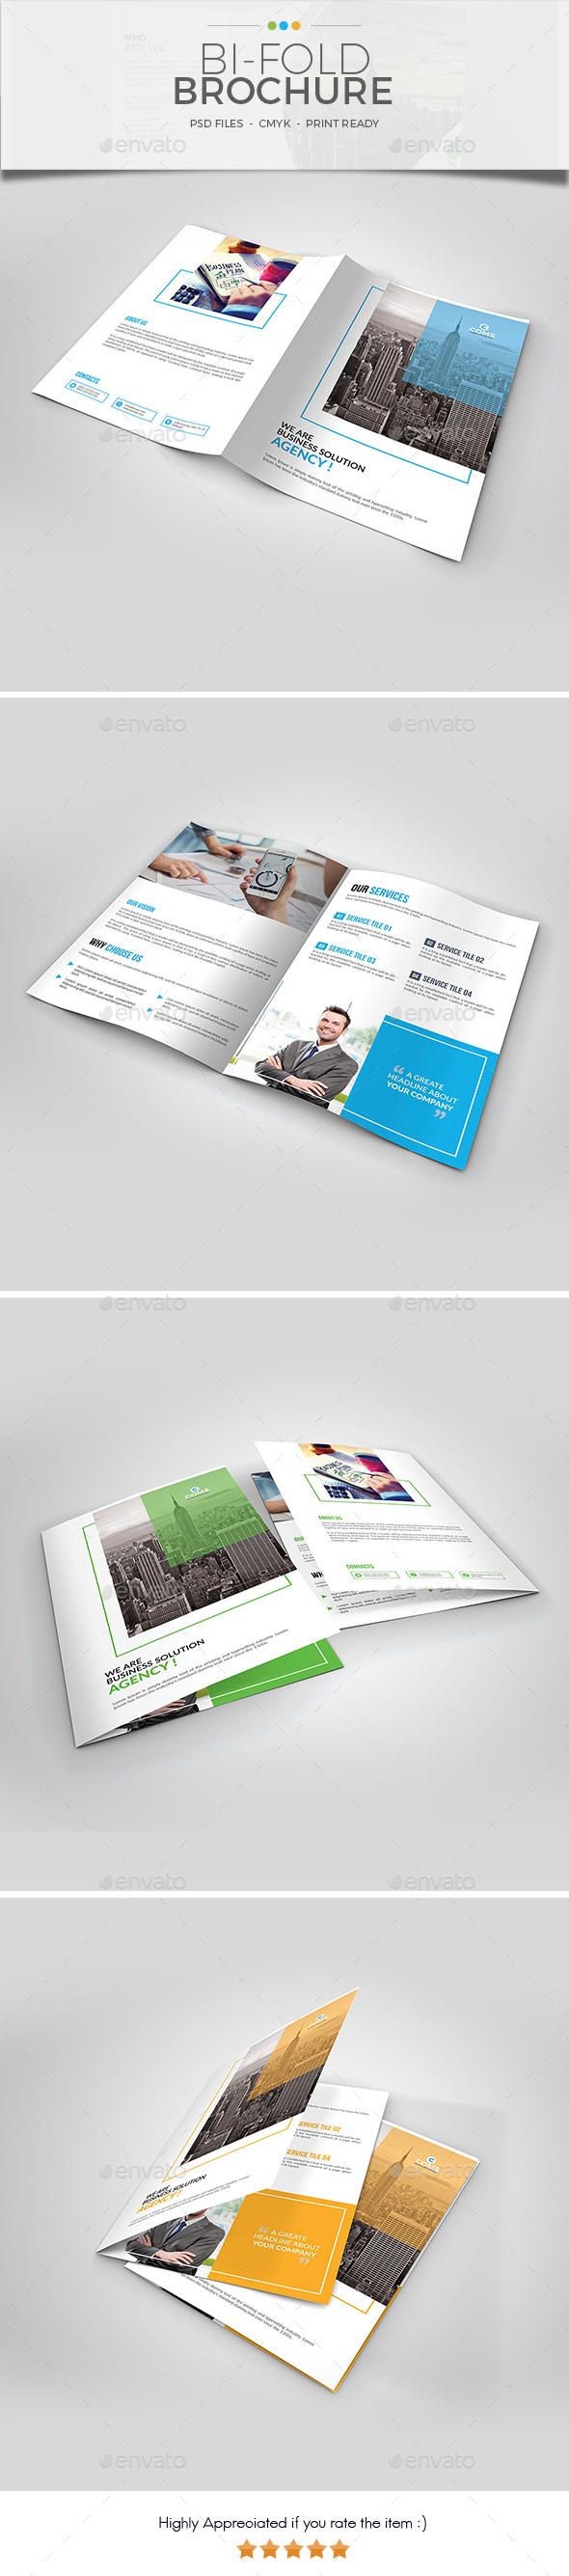 Bi Fold Brochure Template 02 - Brochures Print Templates